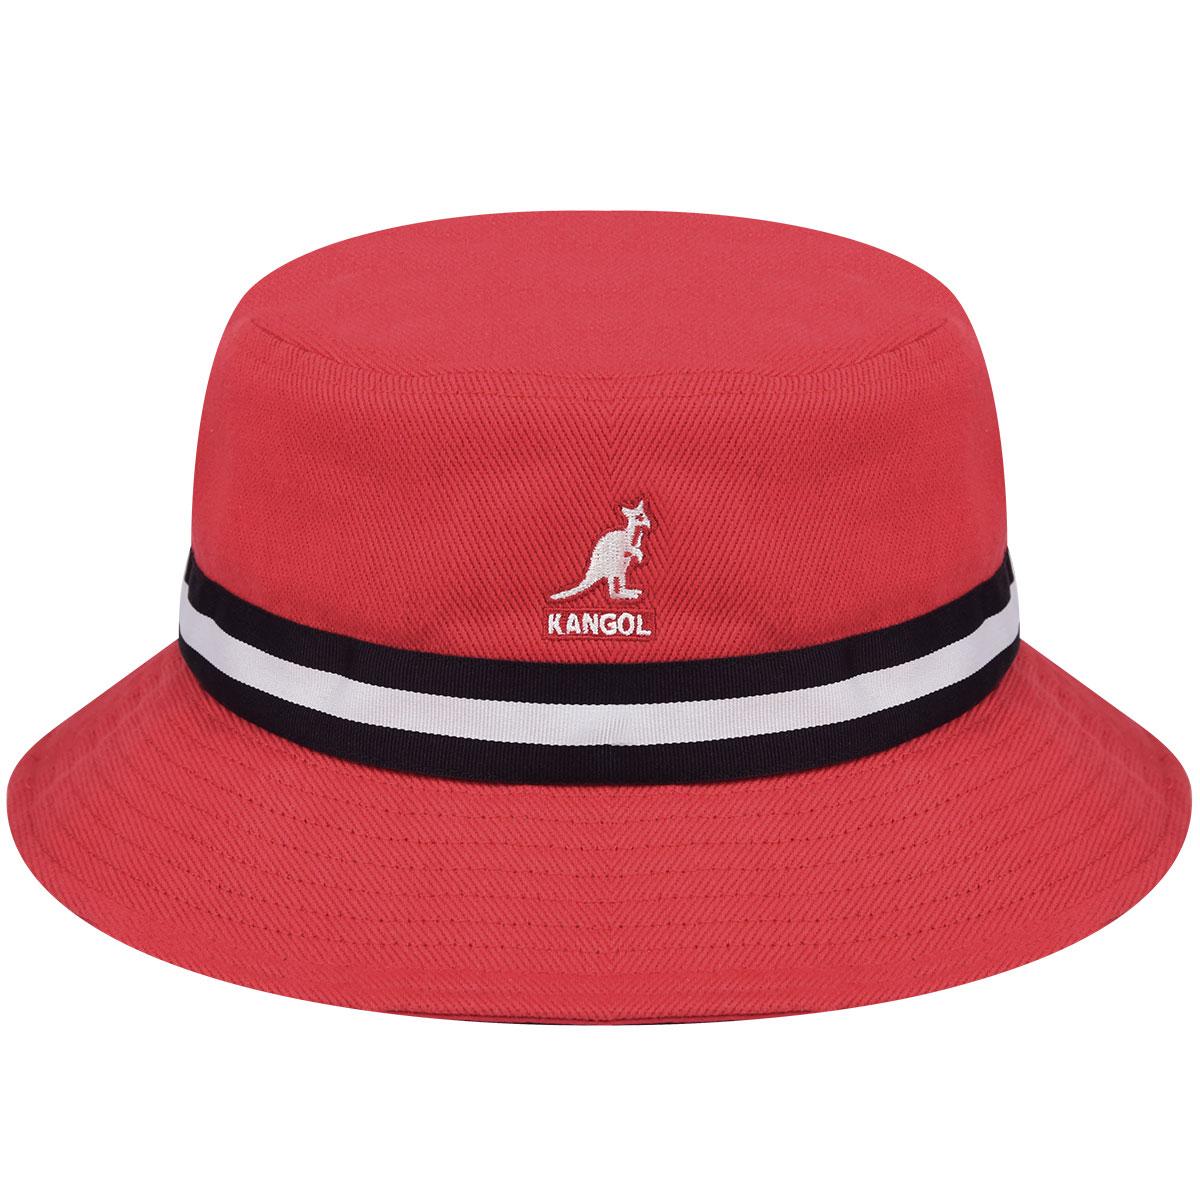 80s Hats, Caps, Visors, Buckets | Women and Men Stripe Lahinch $37.50 AT vintagedancer.com